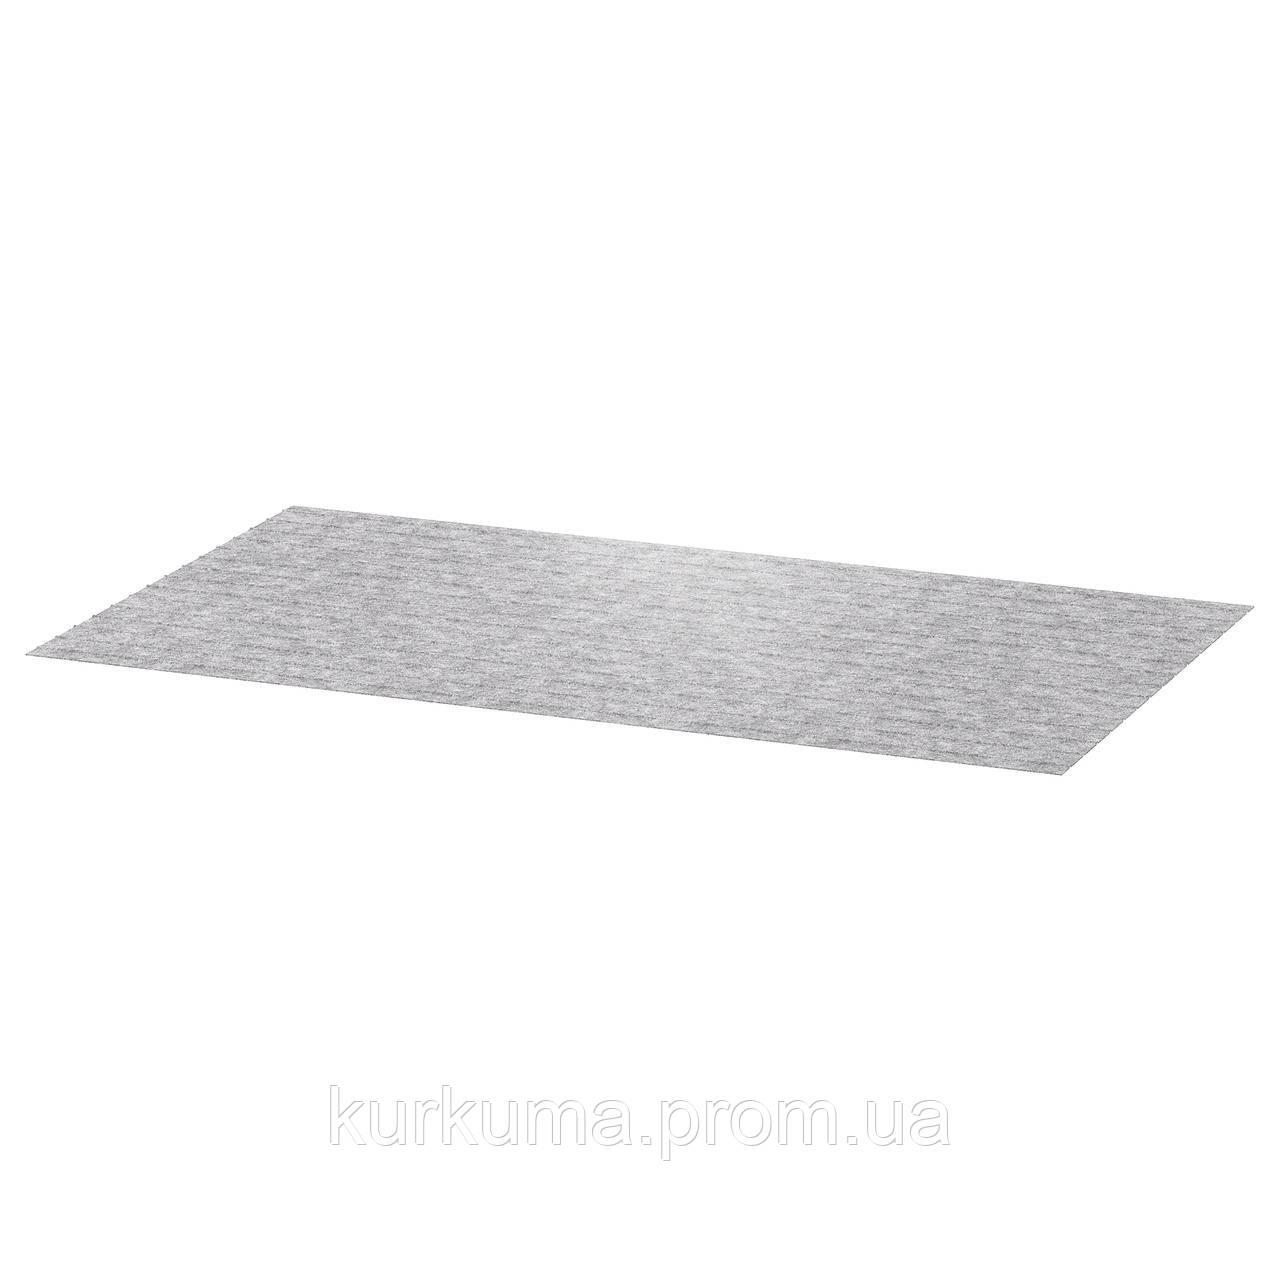 IKEA PASSARP Коврик для ящика, серый  (203.159.66)